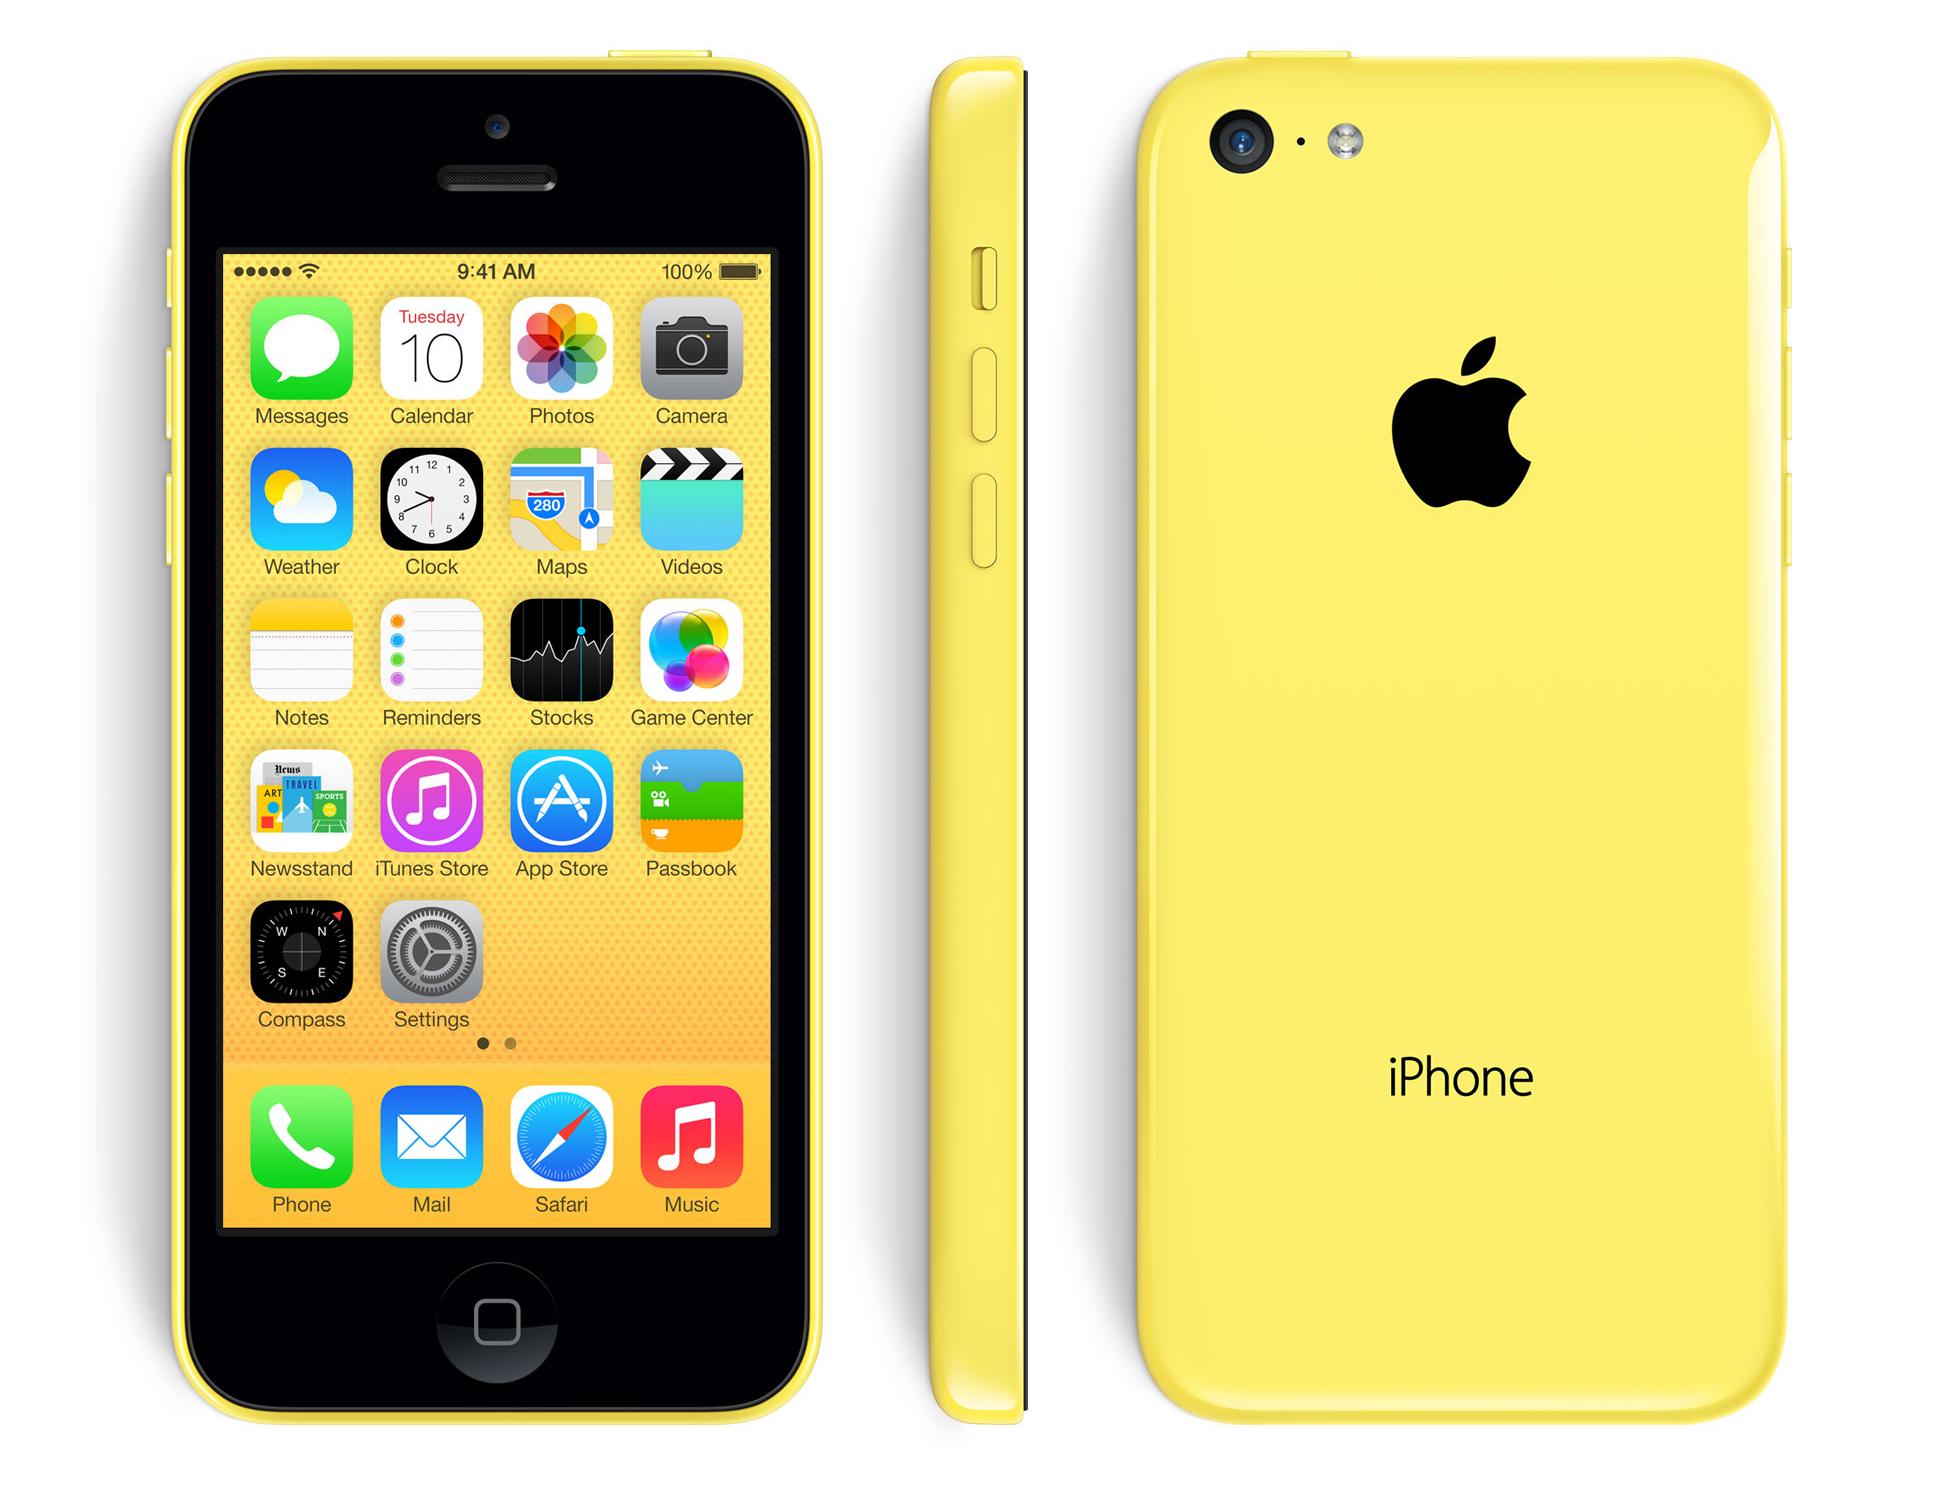 Iphone 5s Wallpapers Hd: IPhone 5S Original Wallpaper